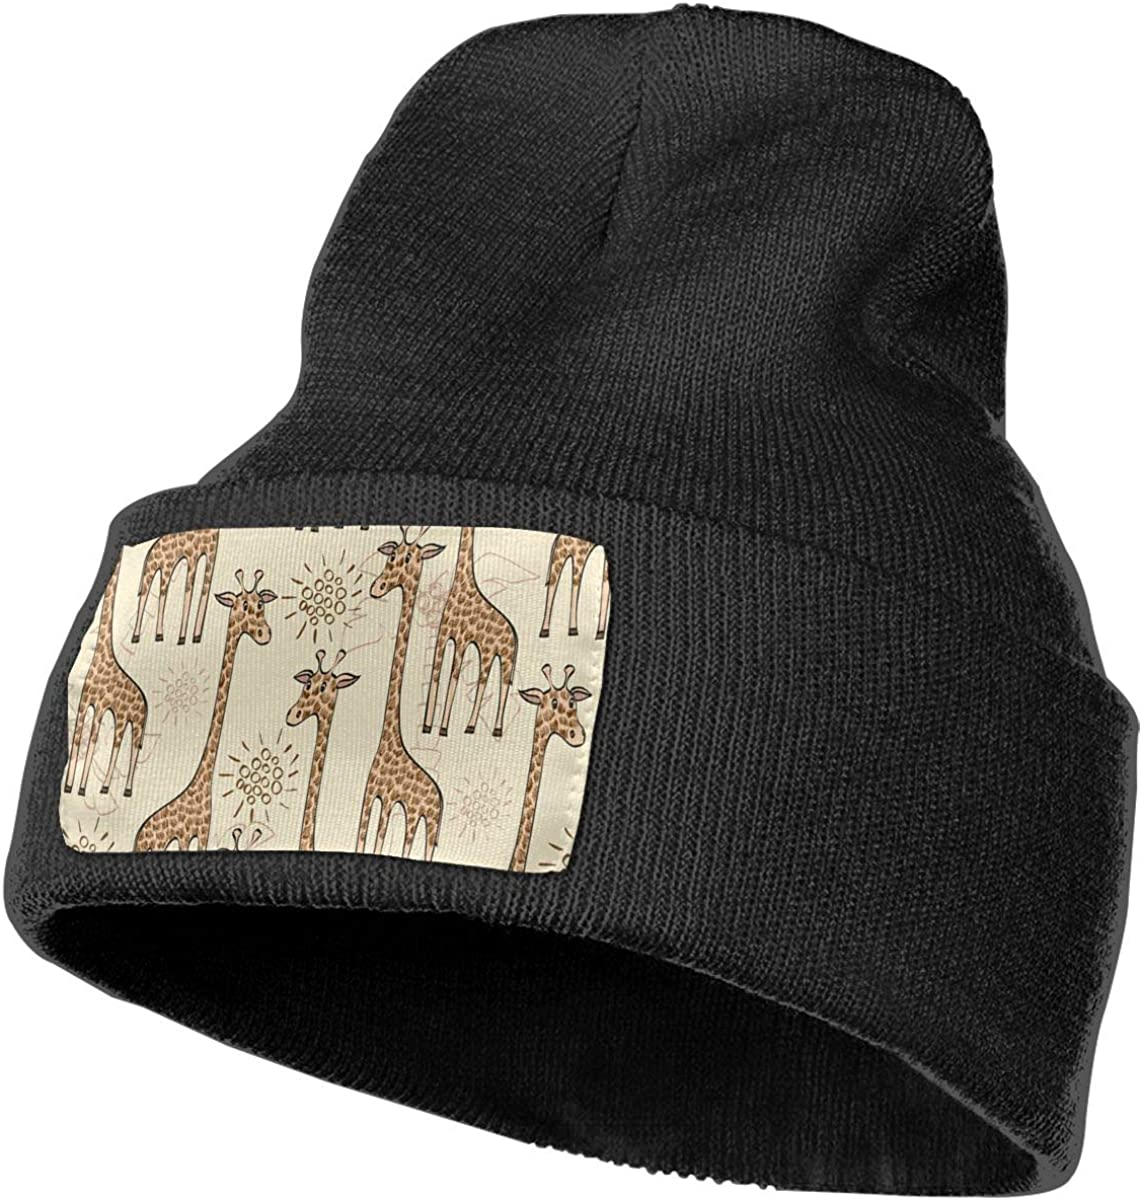 G-Fulling Cartoon Giraffe Woolen Hat Unisex Beanie Hat Warm Hats Skull Cap Knitted Hat